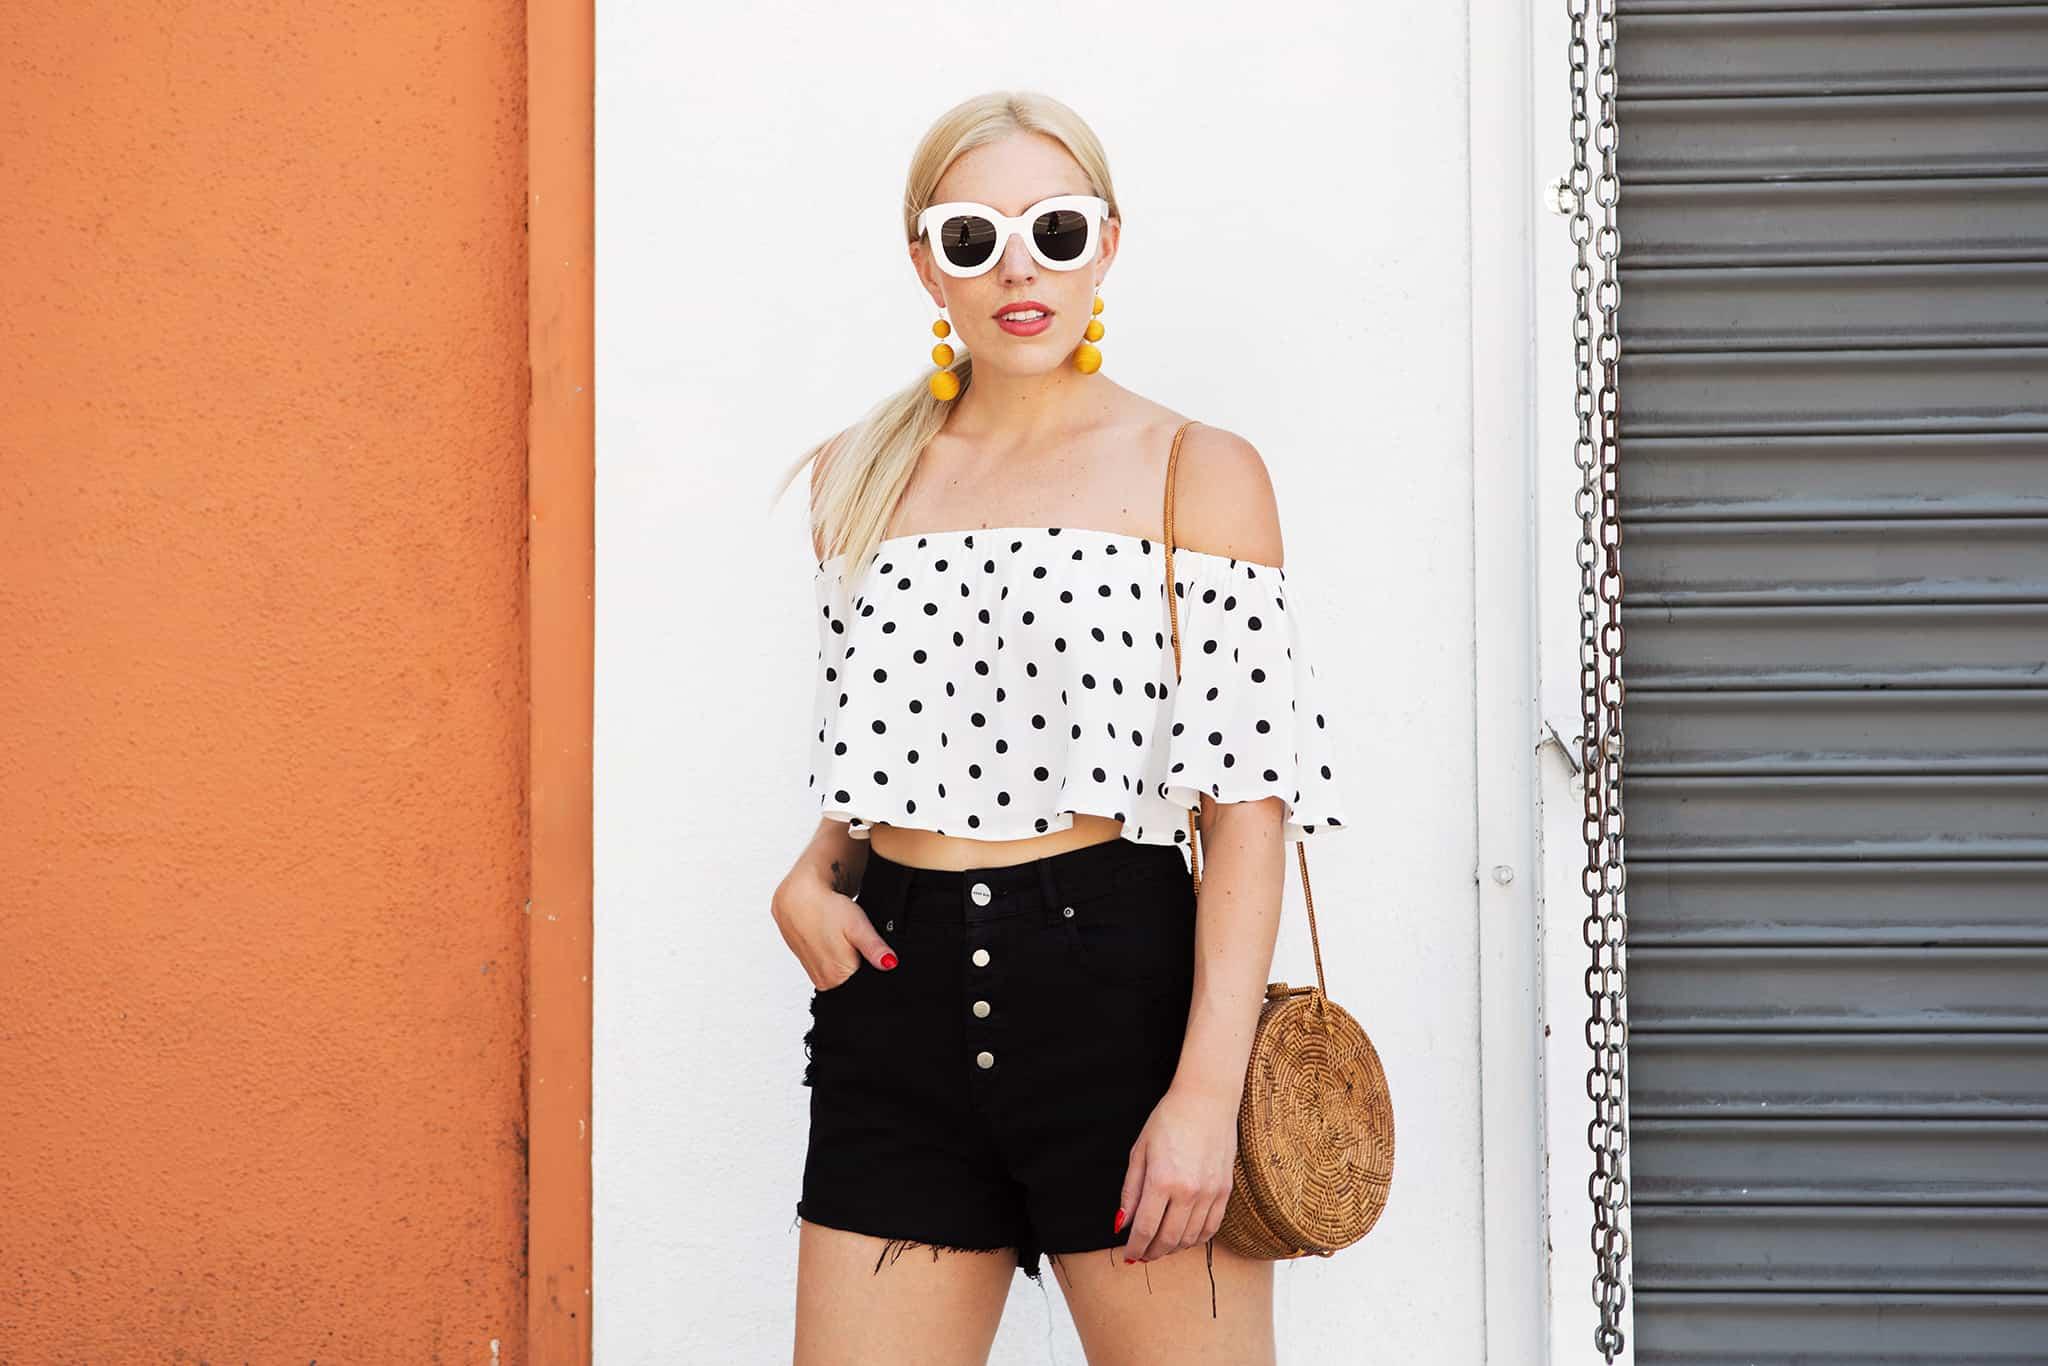 woman wearing white sunglasses, polka dots top, and denim shorts